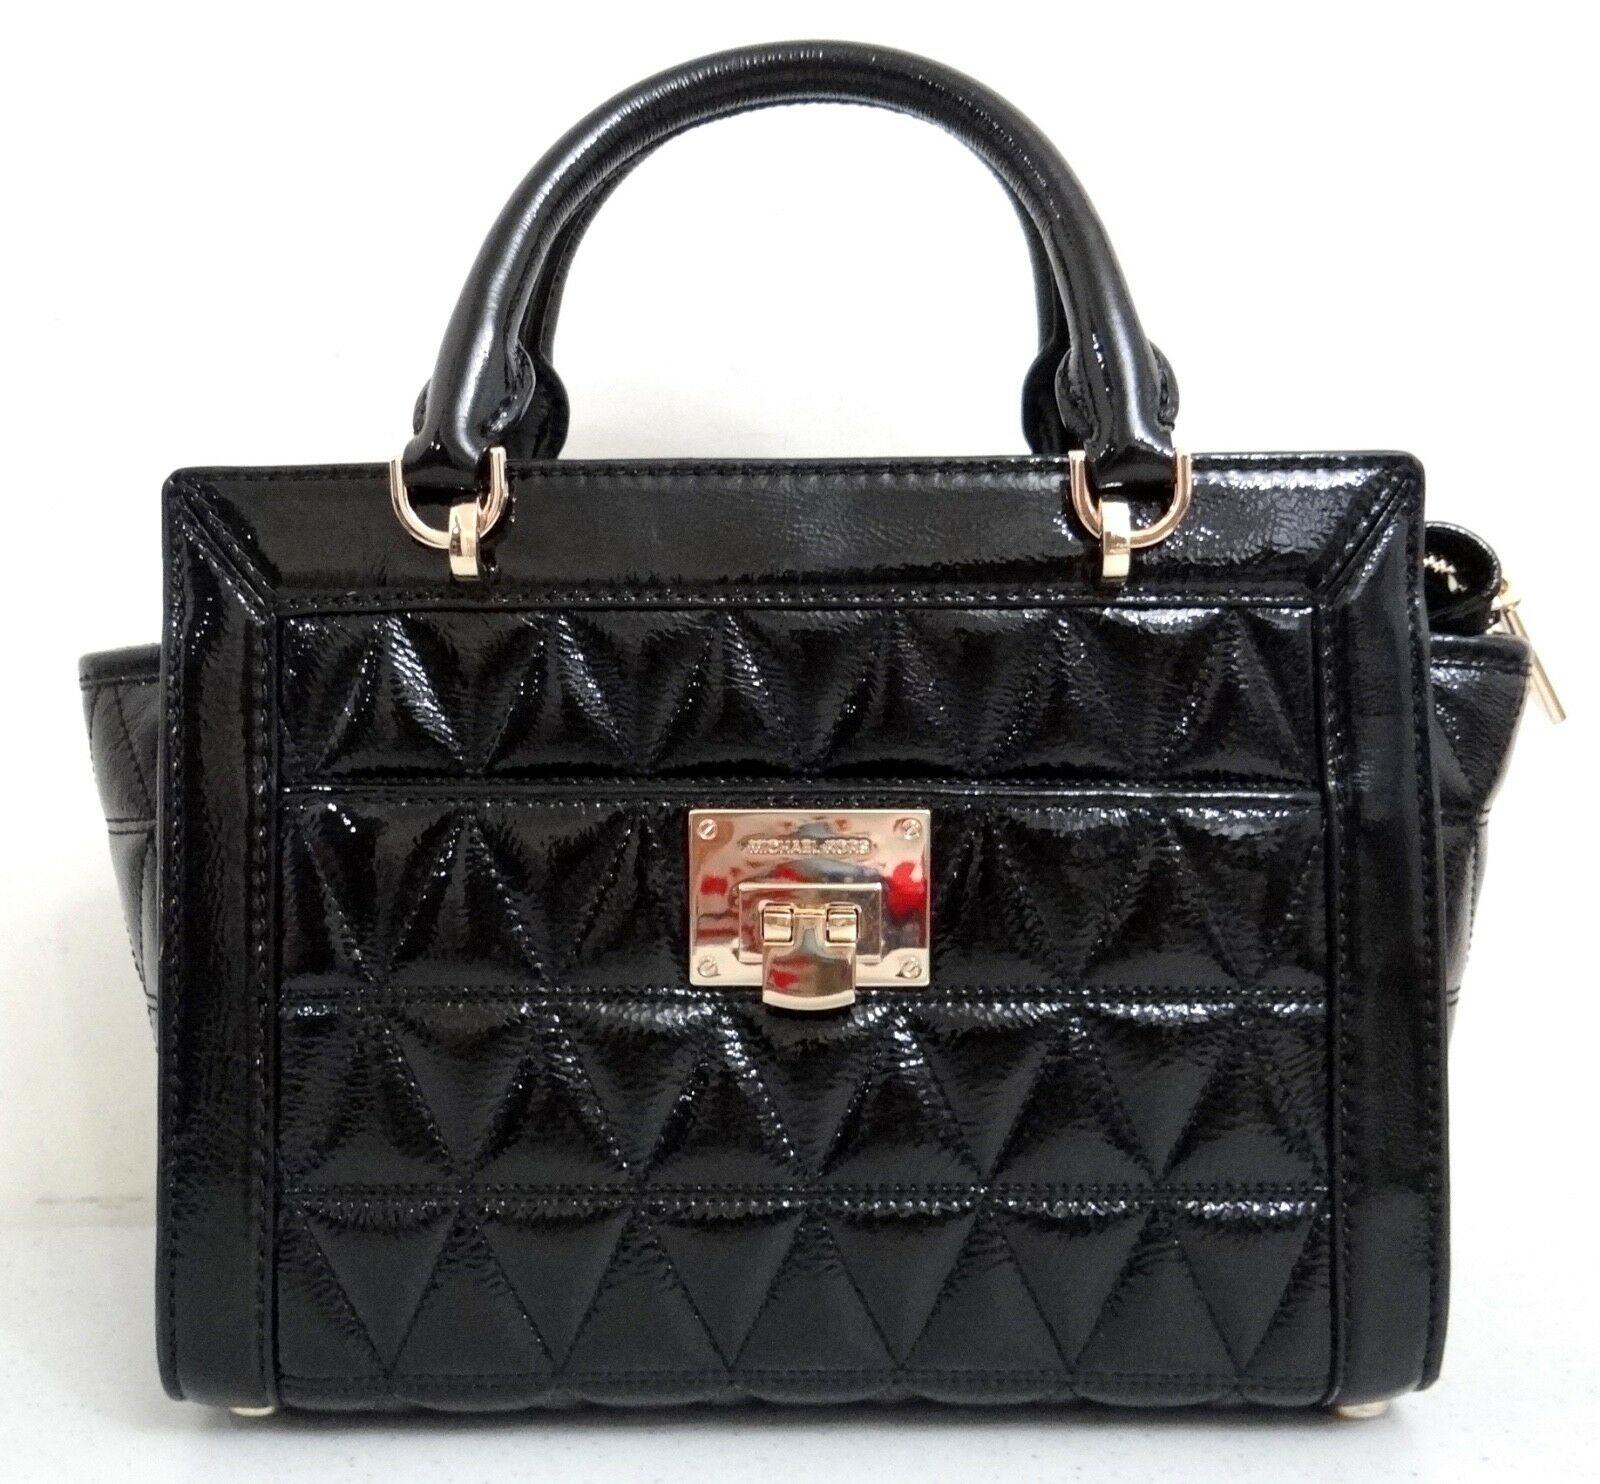 Michael Kors Women's Vivianne Satchel Crossbody Bag Black MK27329